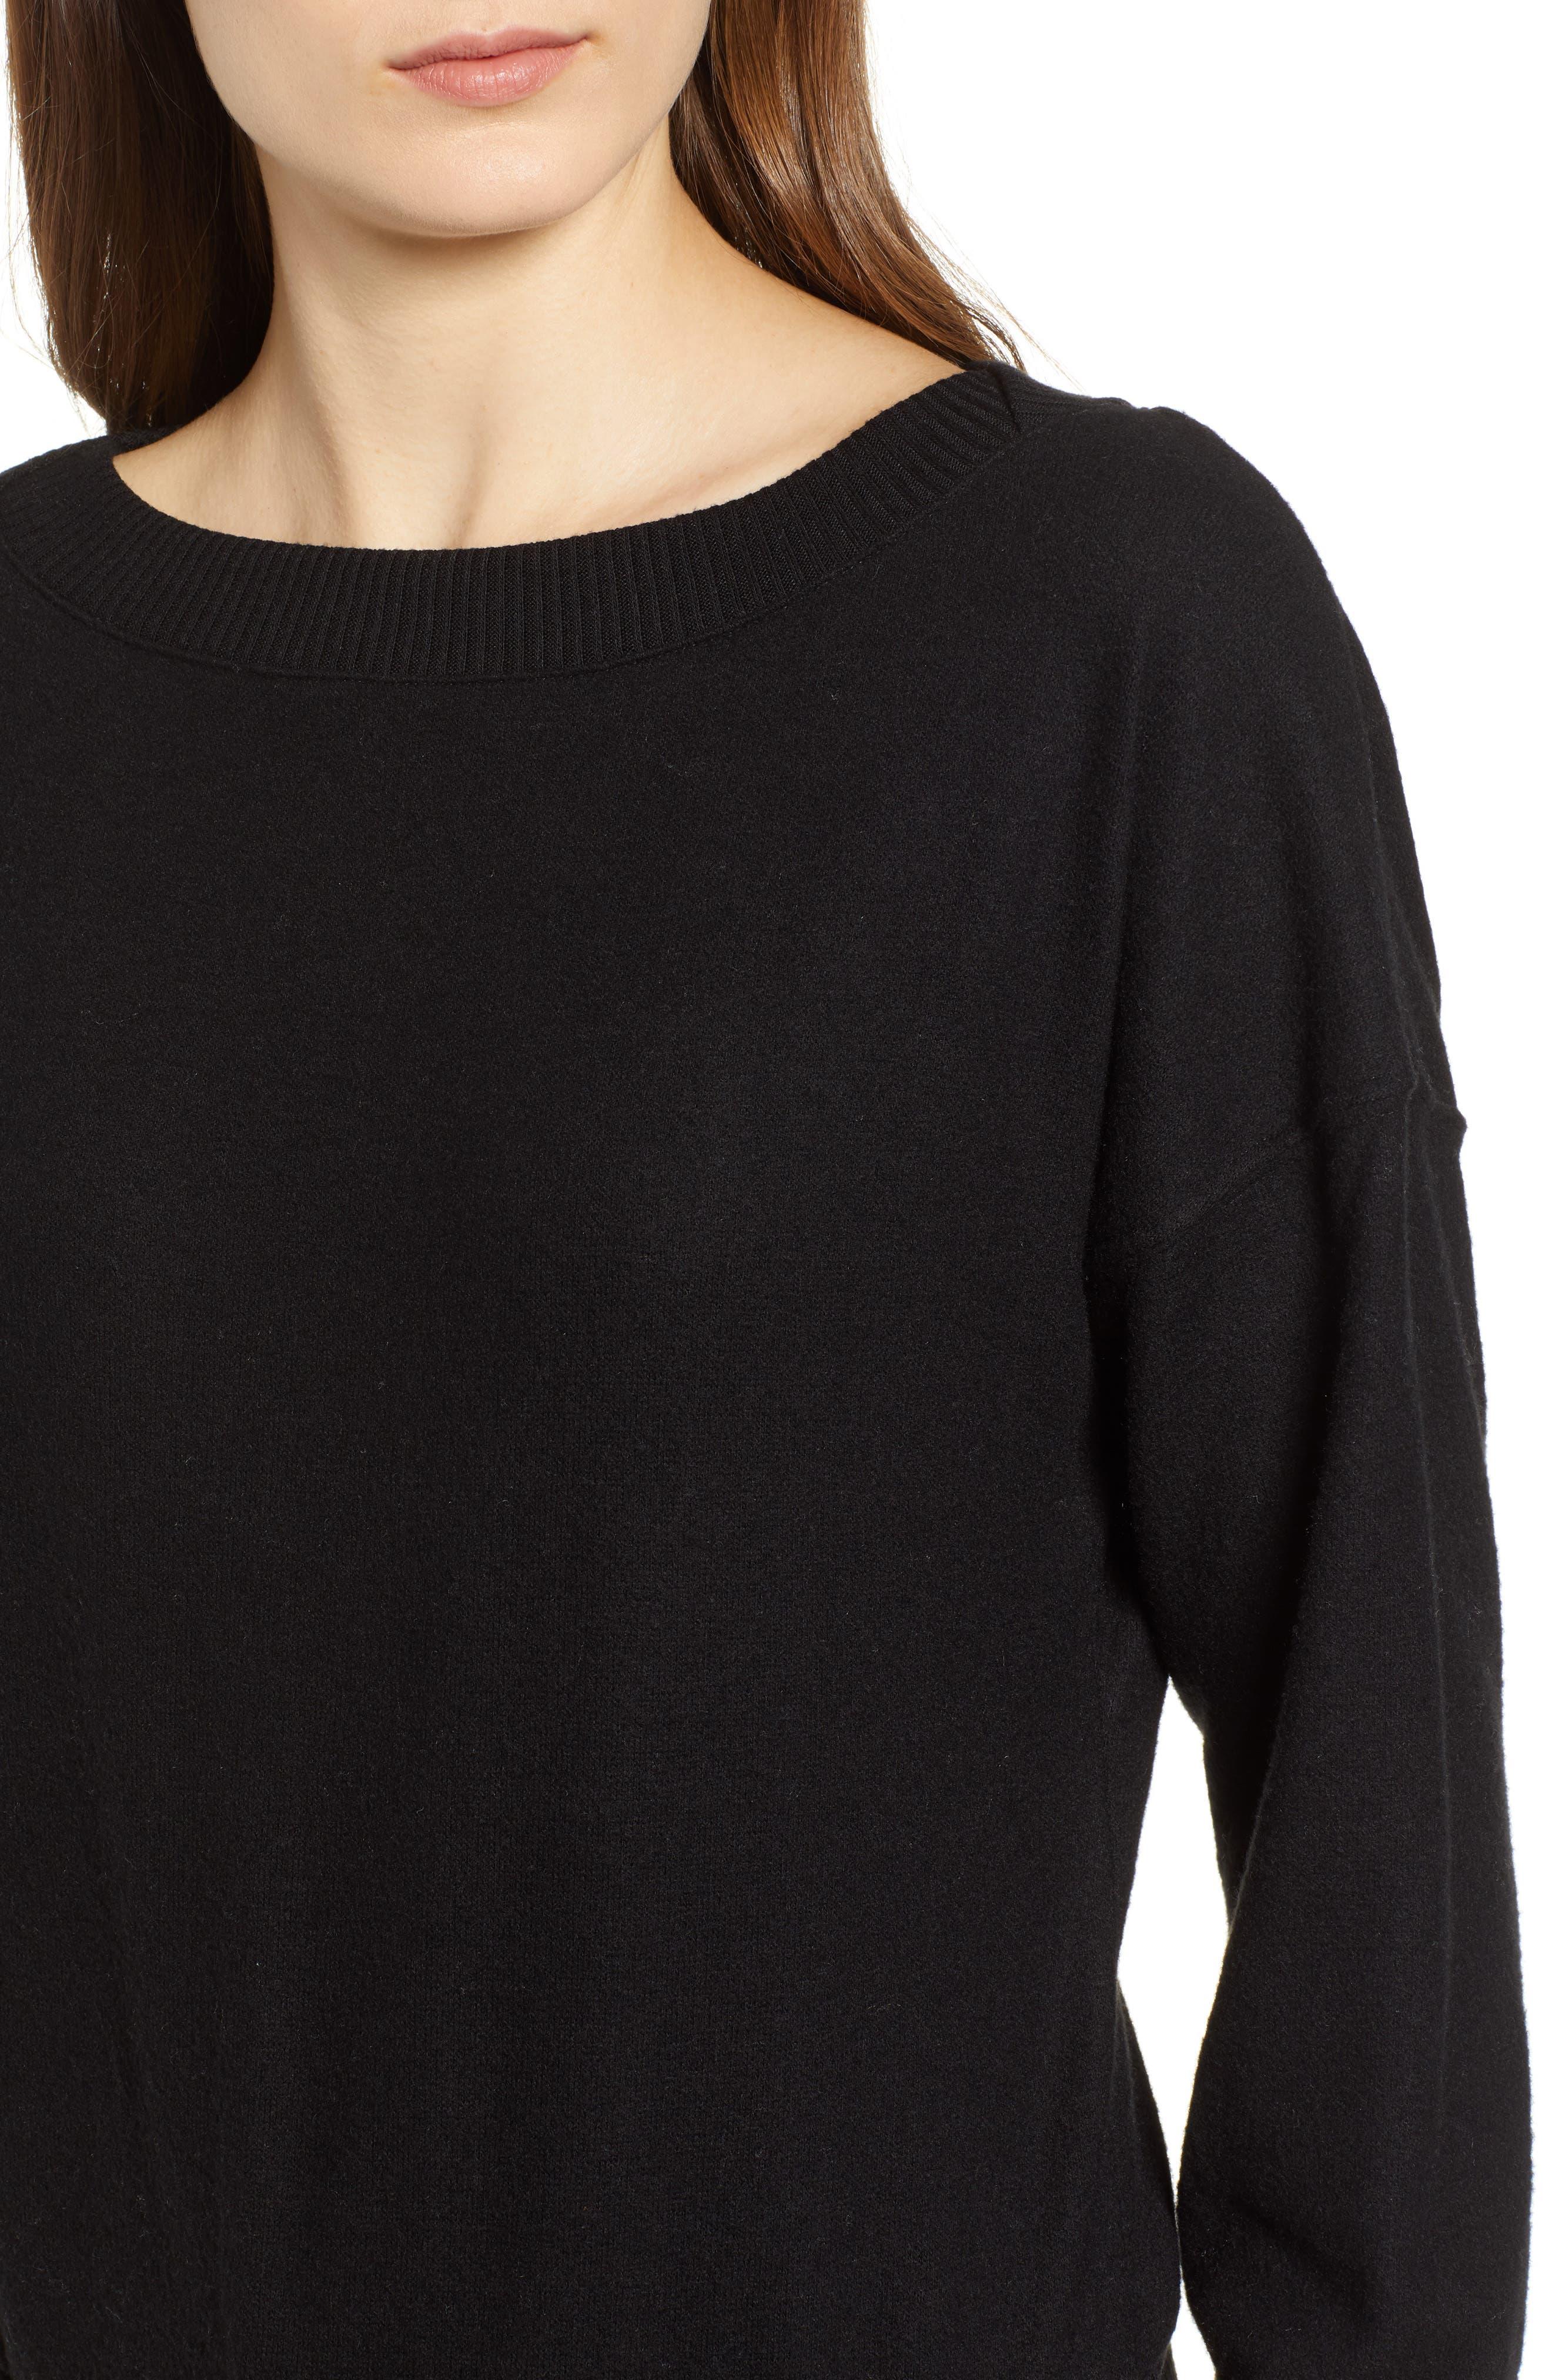 Darwin Cozy Sweatshirt,                             Alternate thumbnail 4, color,                             BLACK